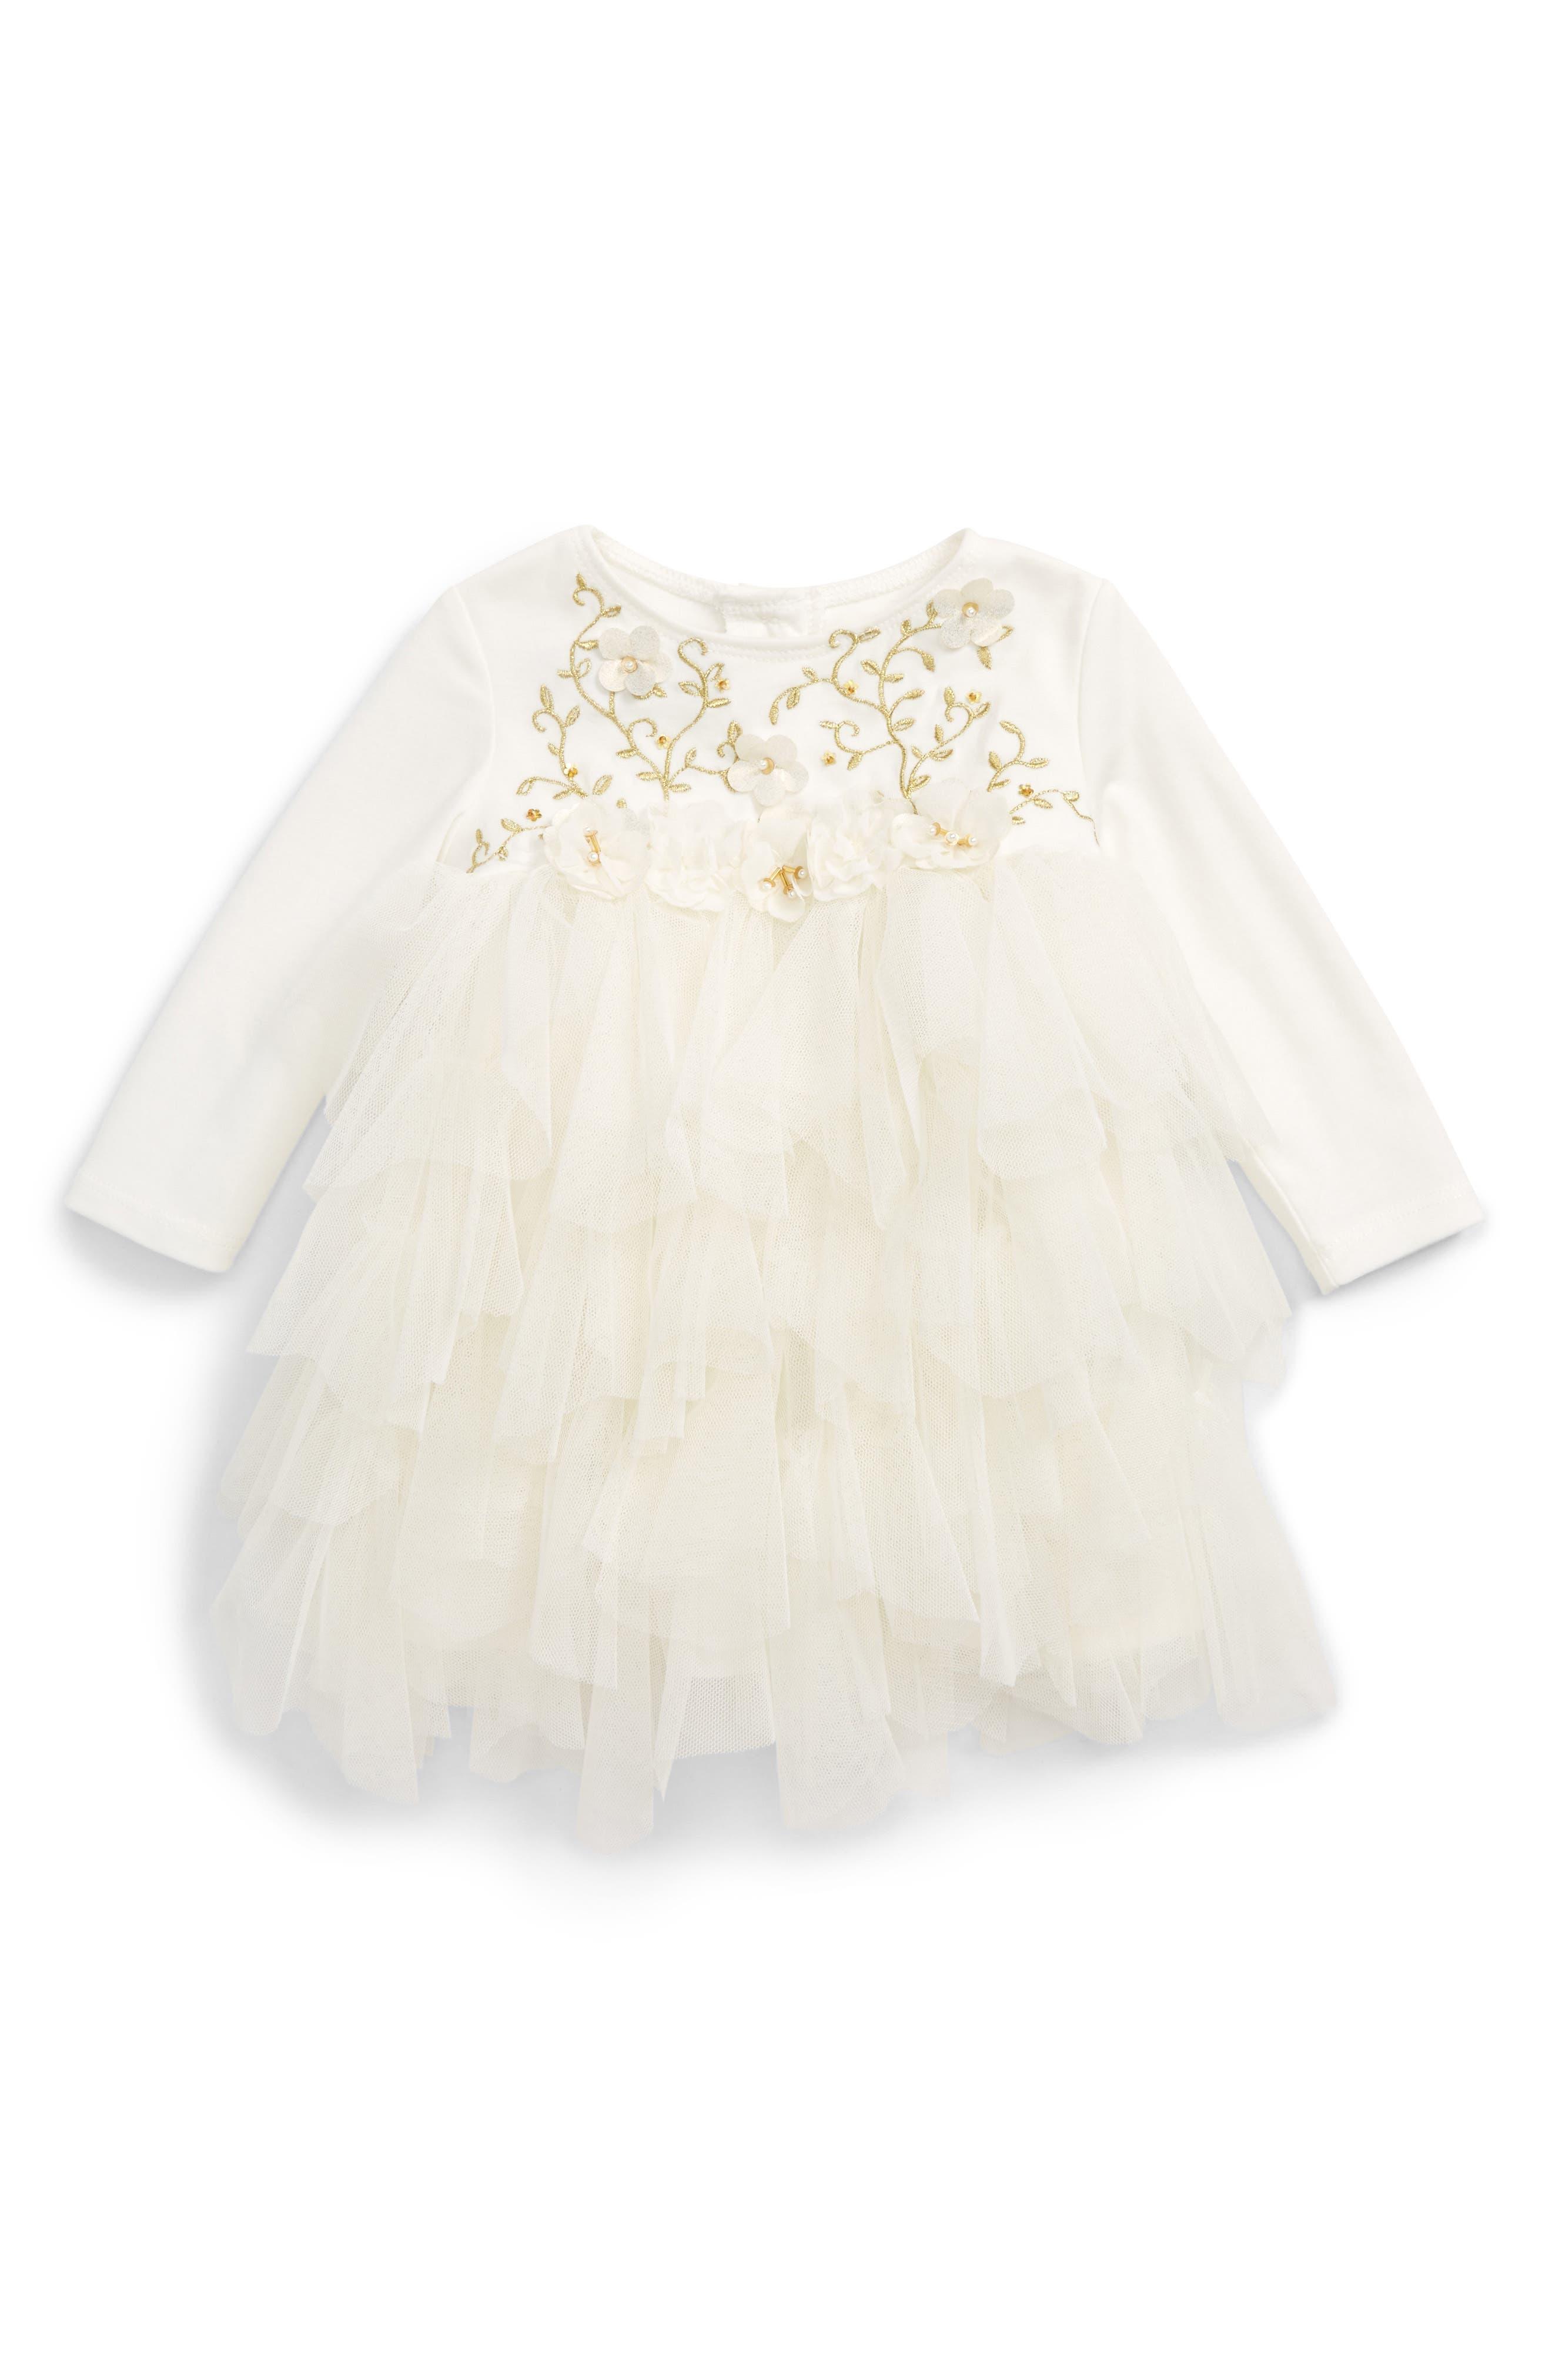 Main Image - Biscotti Embroidered Bodice Dress (Baby Girls)